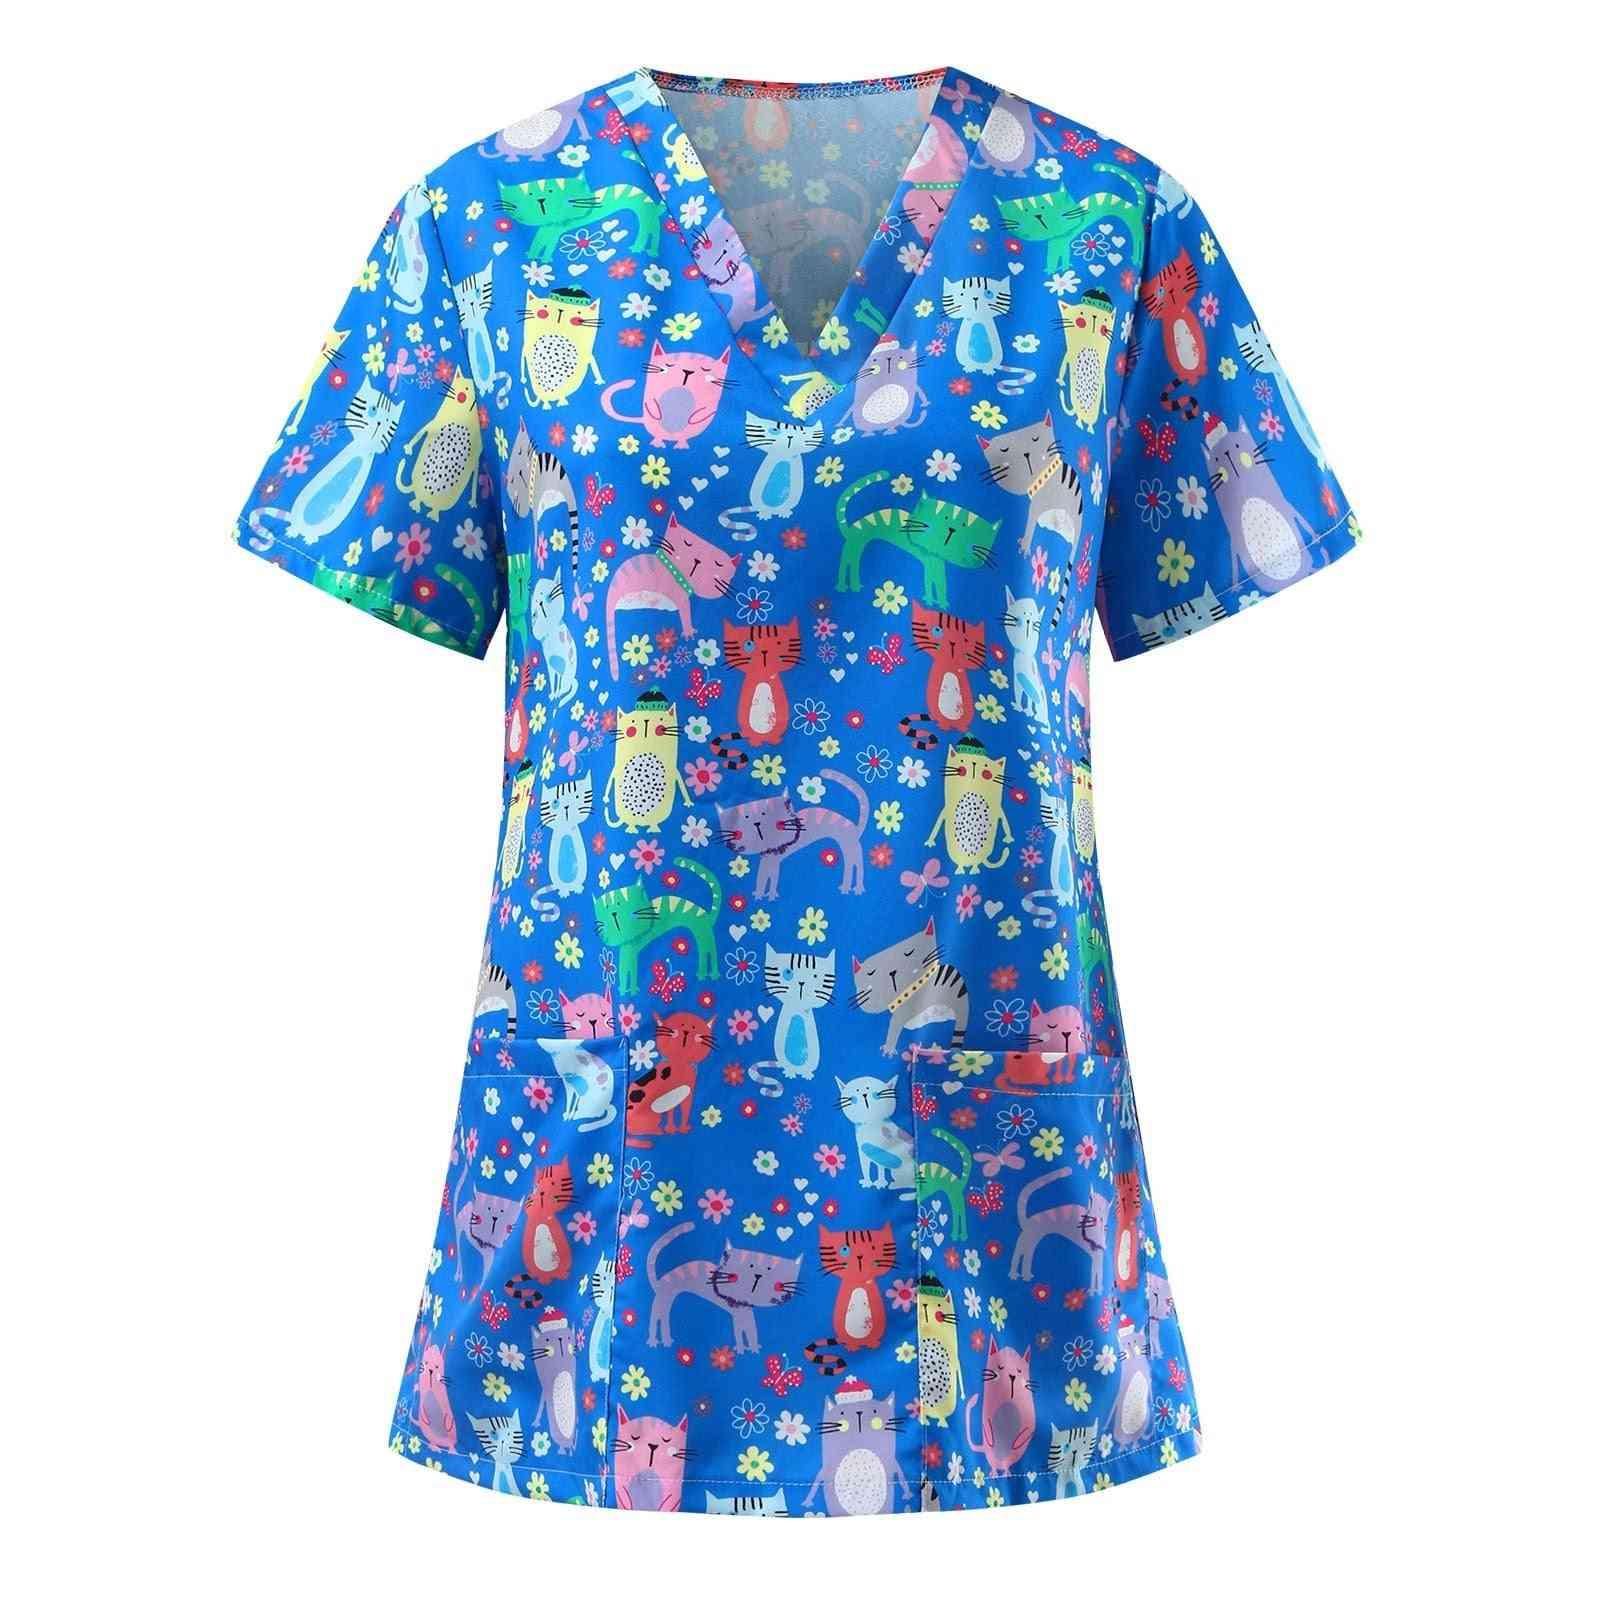 Women Blouse Short Sleeve Flower Printed V-neck Cartoon Pattern Tops